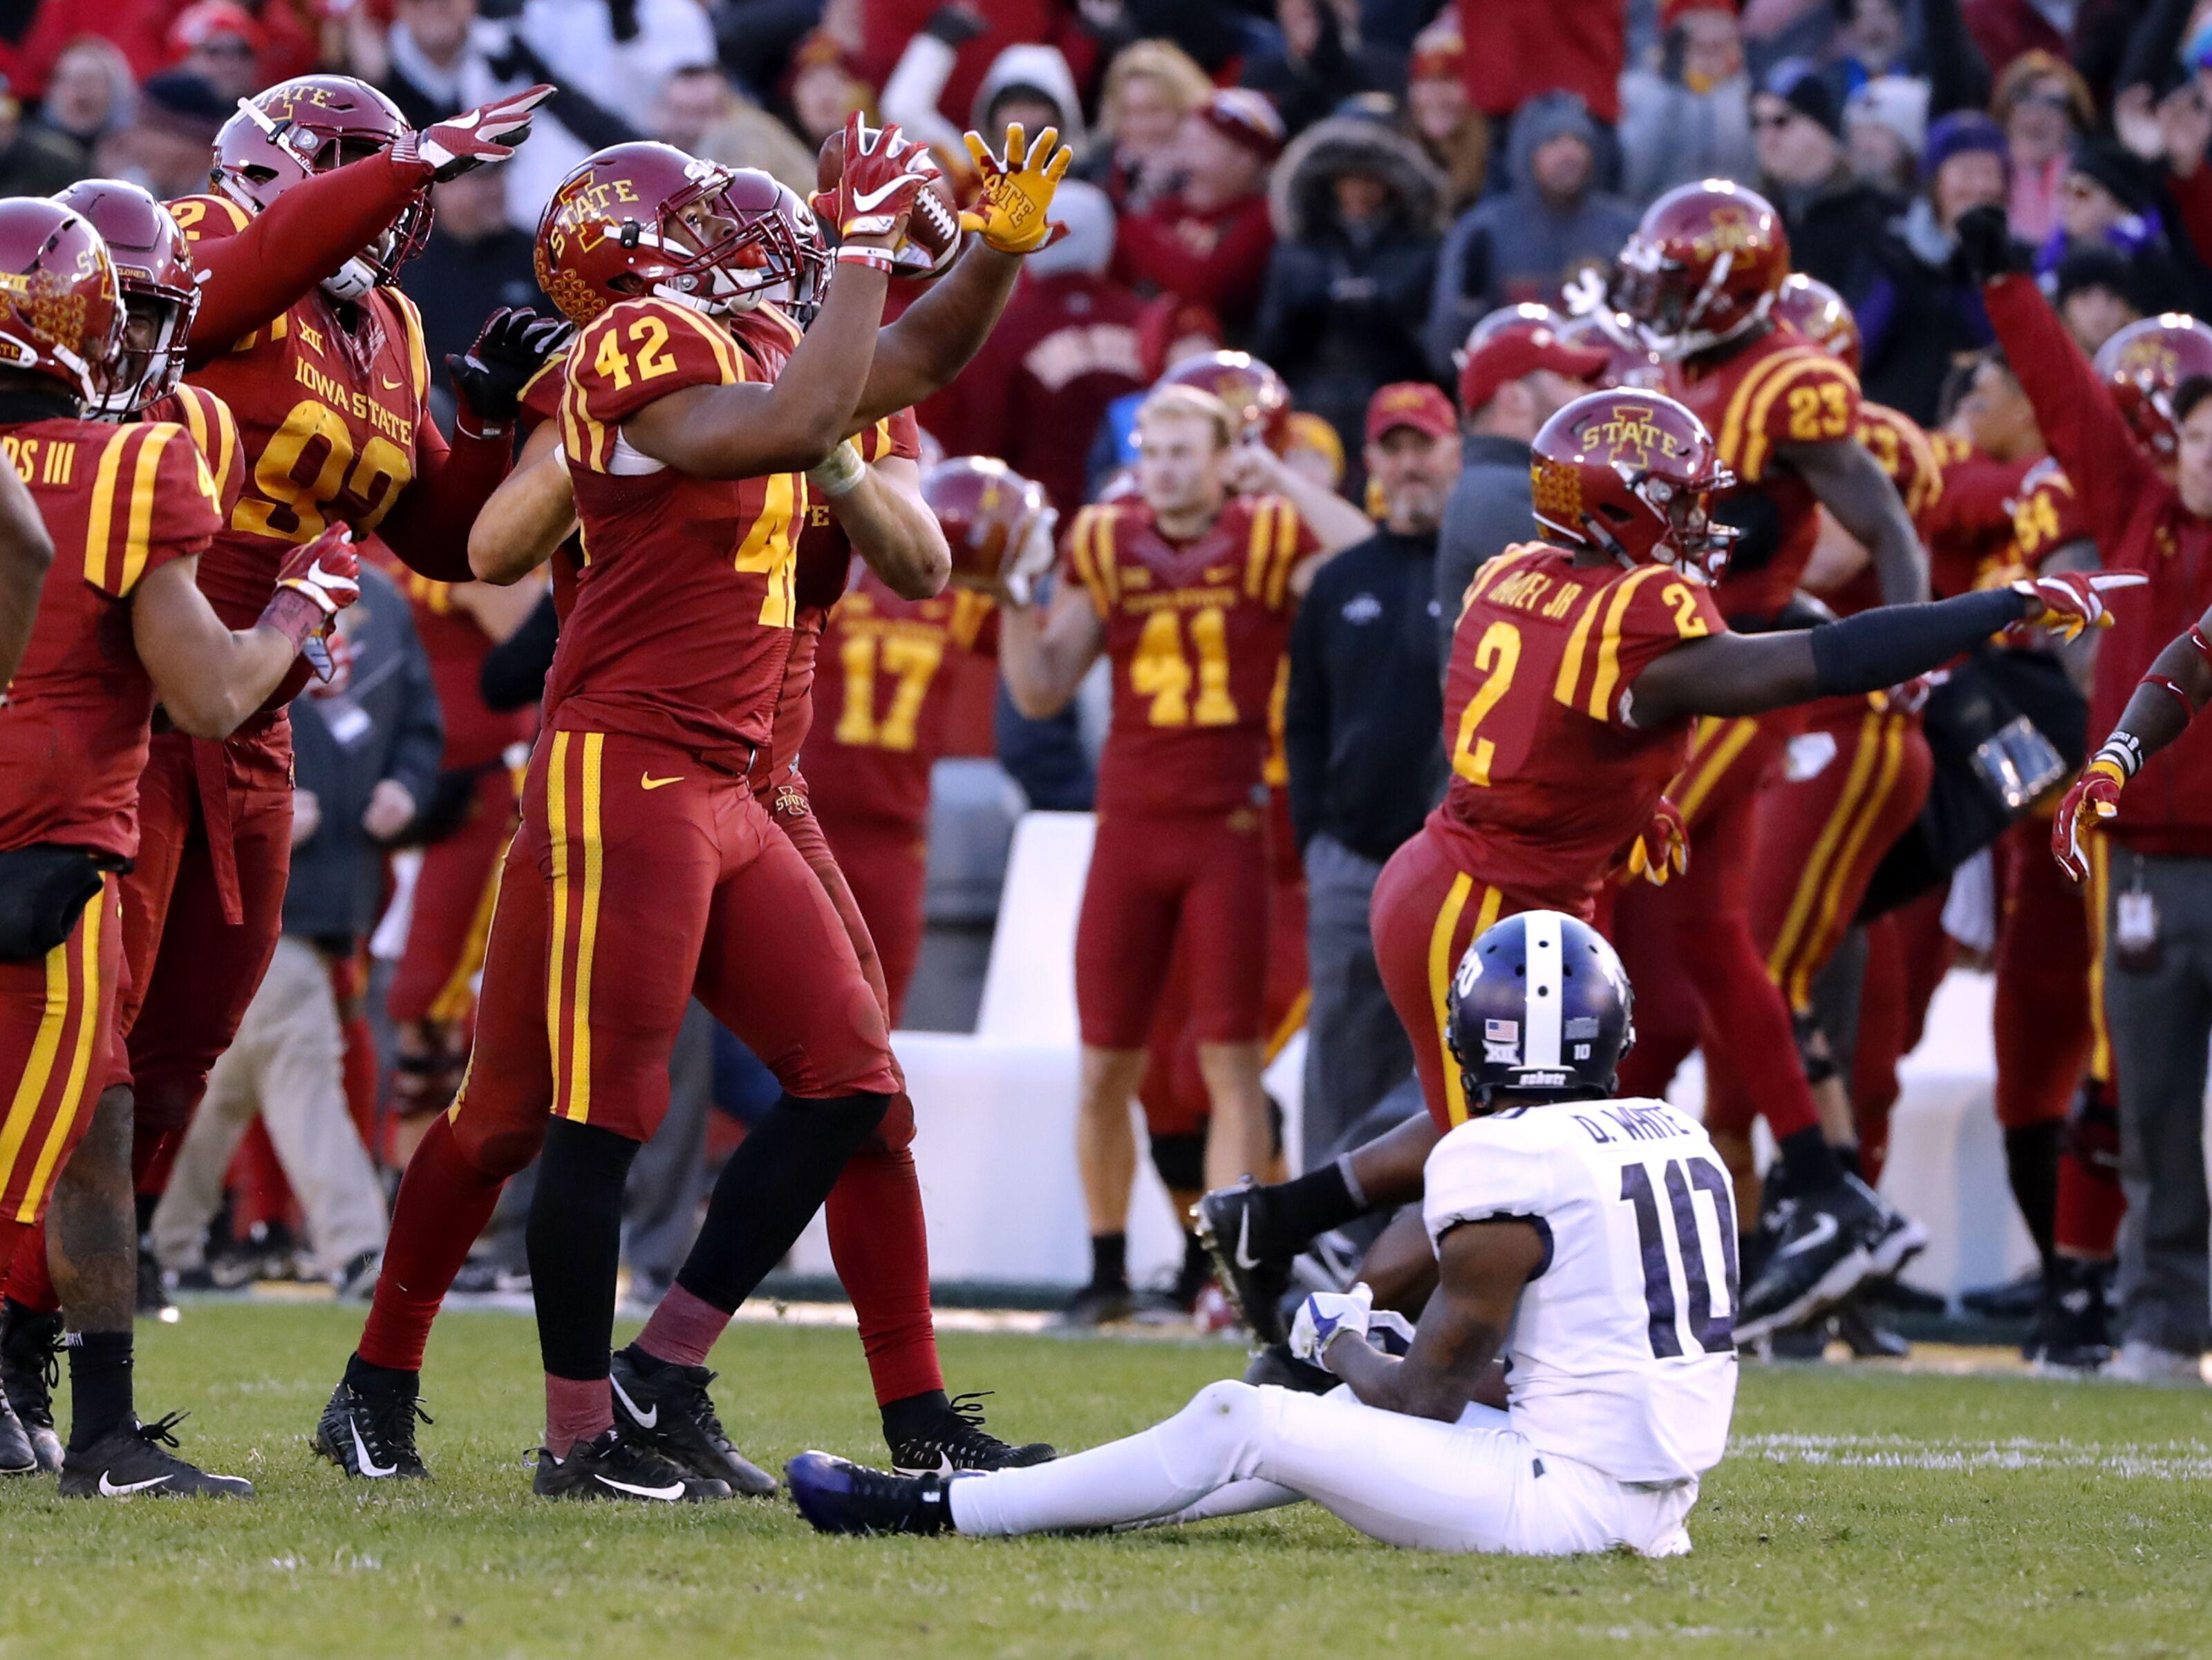 Iowa State Football: 5 reasons Cyclones will beat Oklahoma